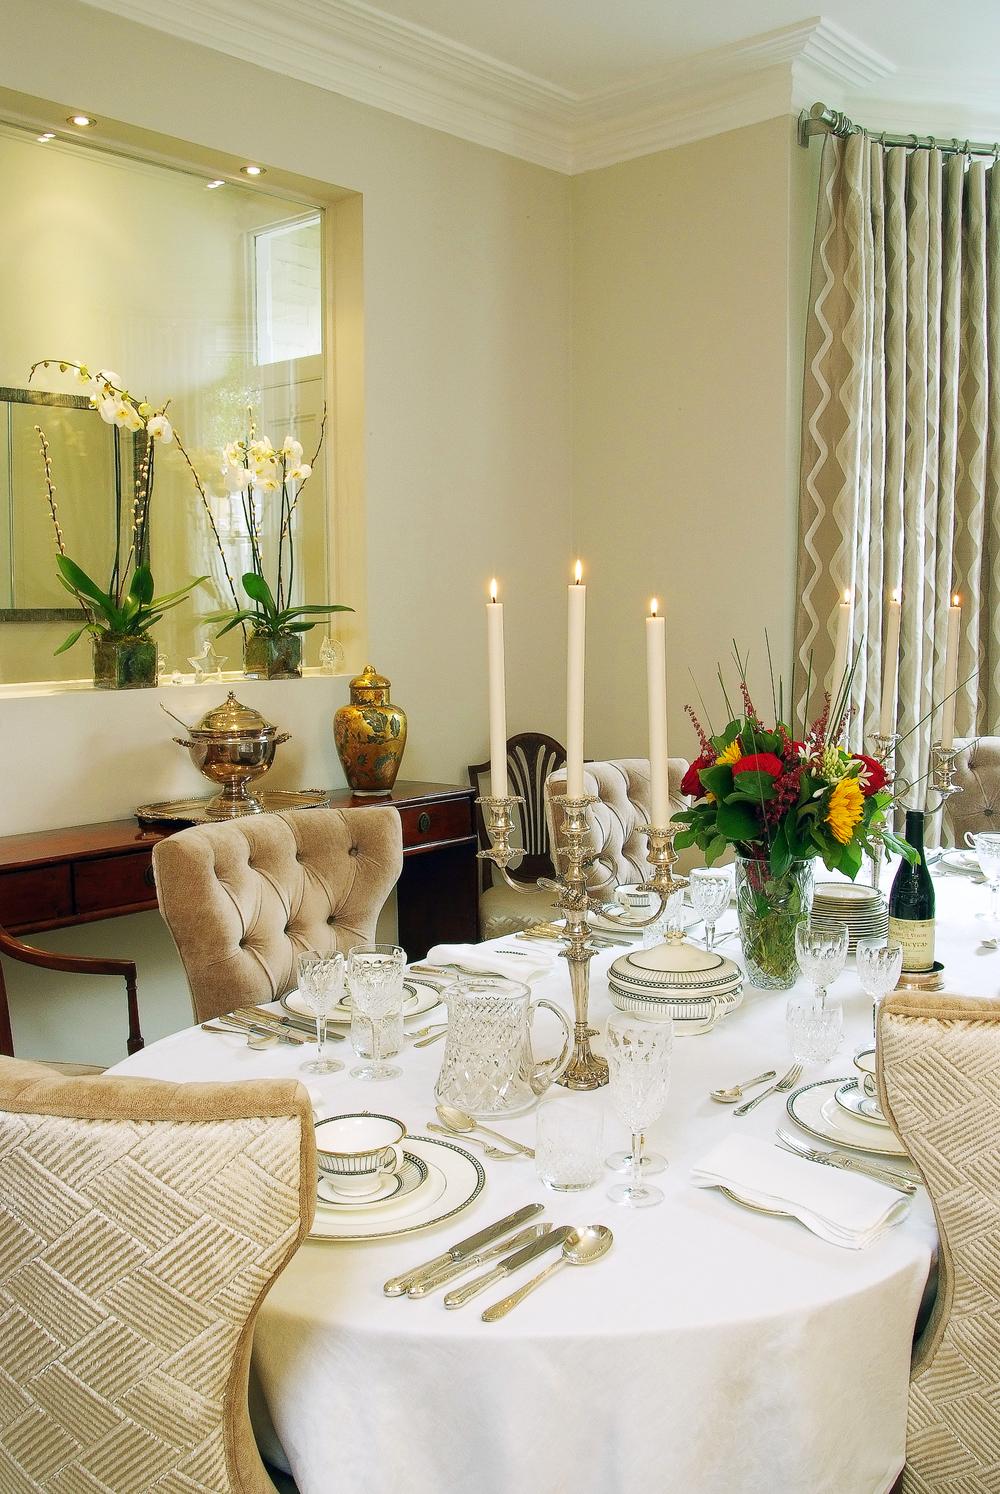 SilkGallery-Dining-room HiRes [b].jpg